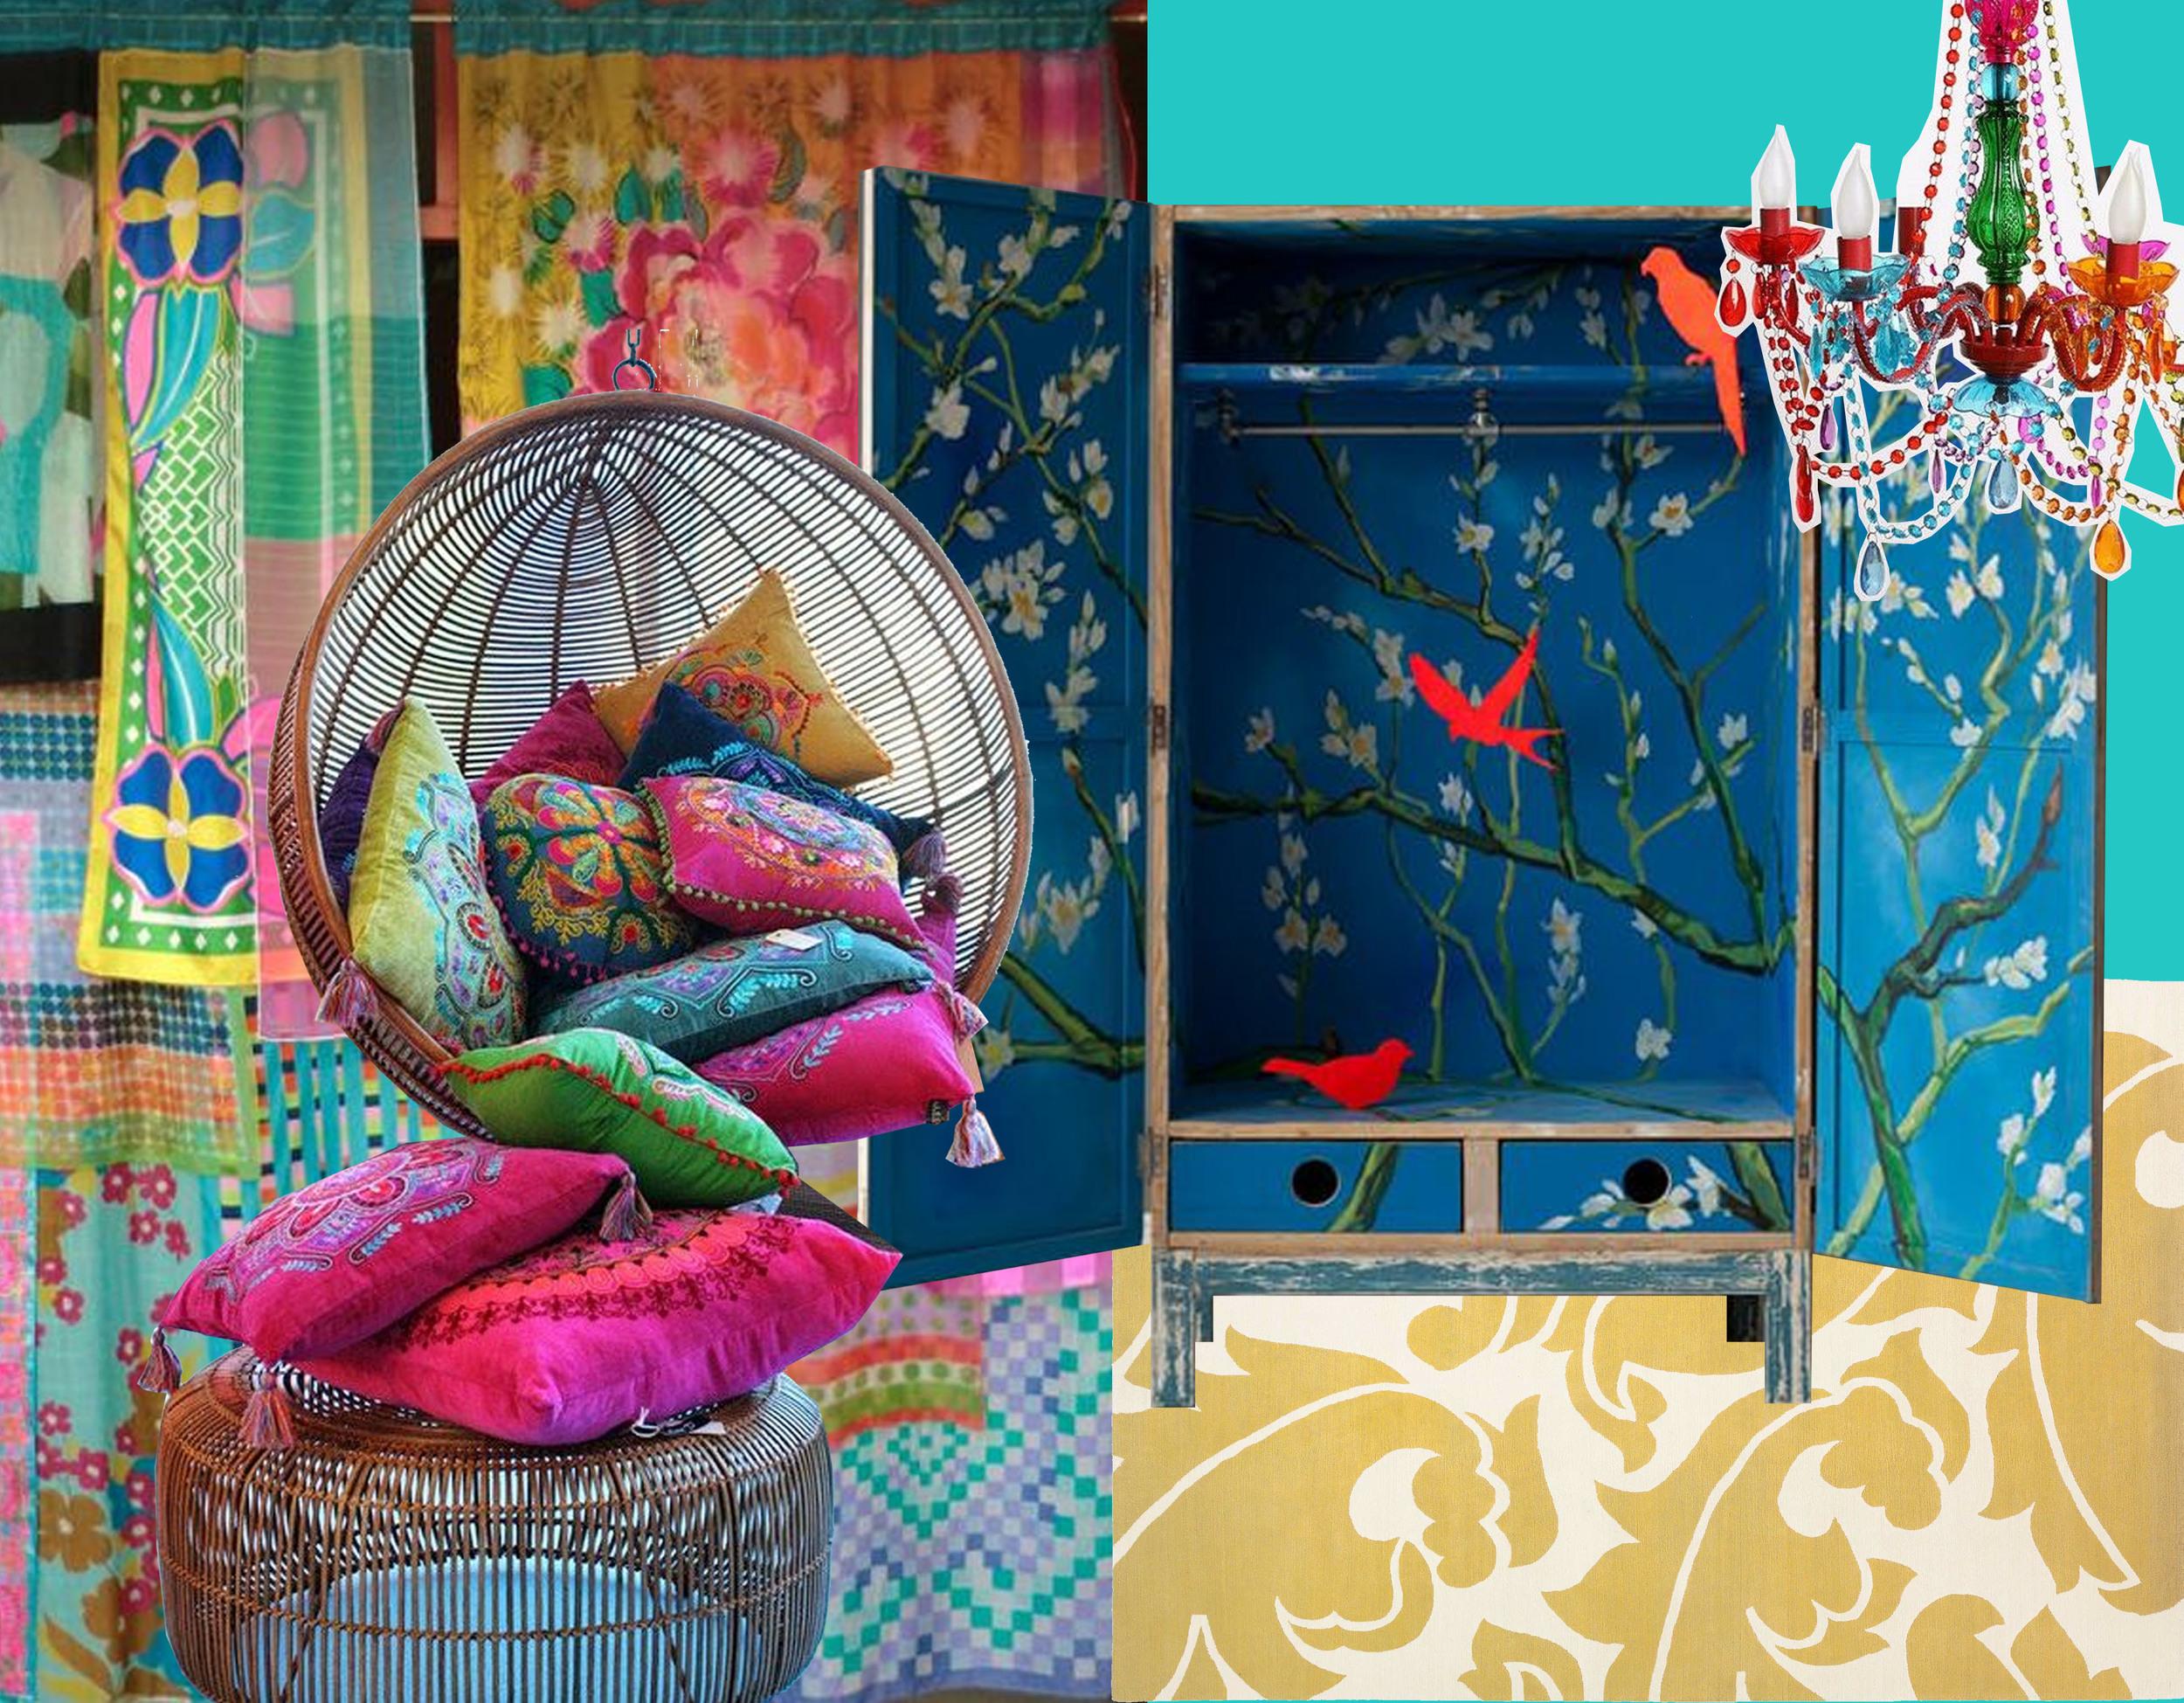 handmade gypsy curtain  Babilon Sisters  - boho chic swing and cushions via  Estiloy Deco  - wardrobe  XO-in my Room  - Overleaf Yello rug  The Rugcompany  - chandelier  Urban Outfitters